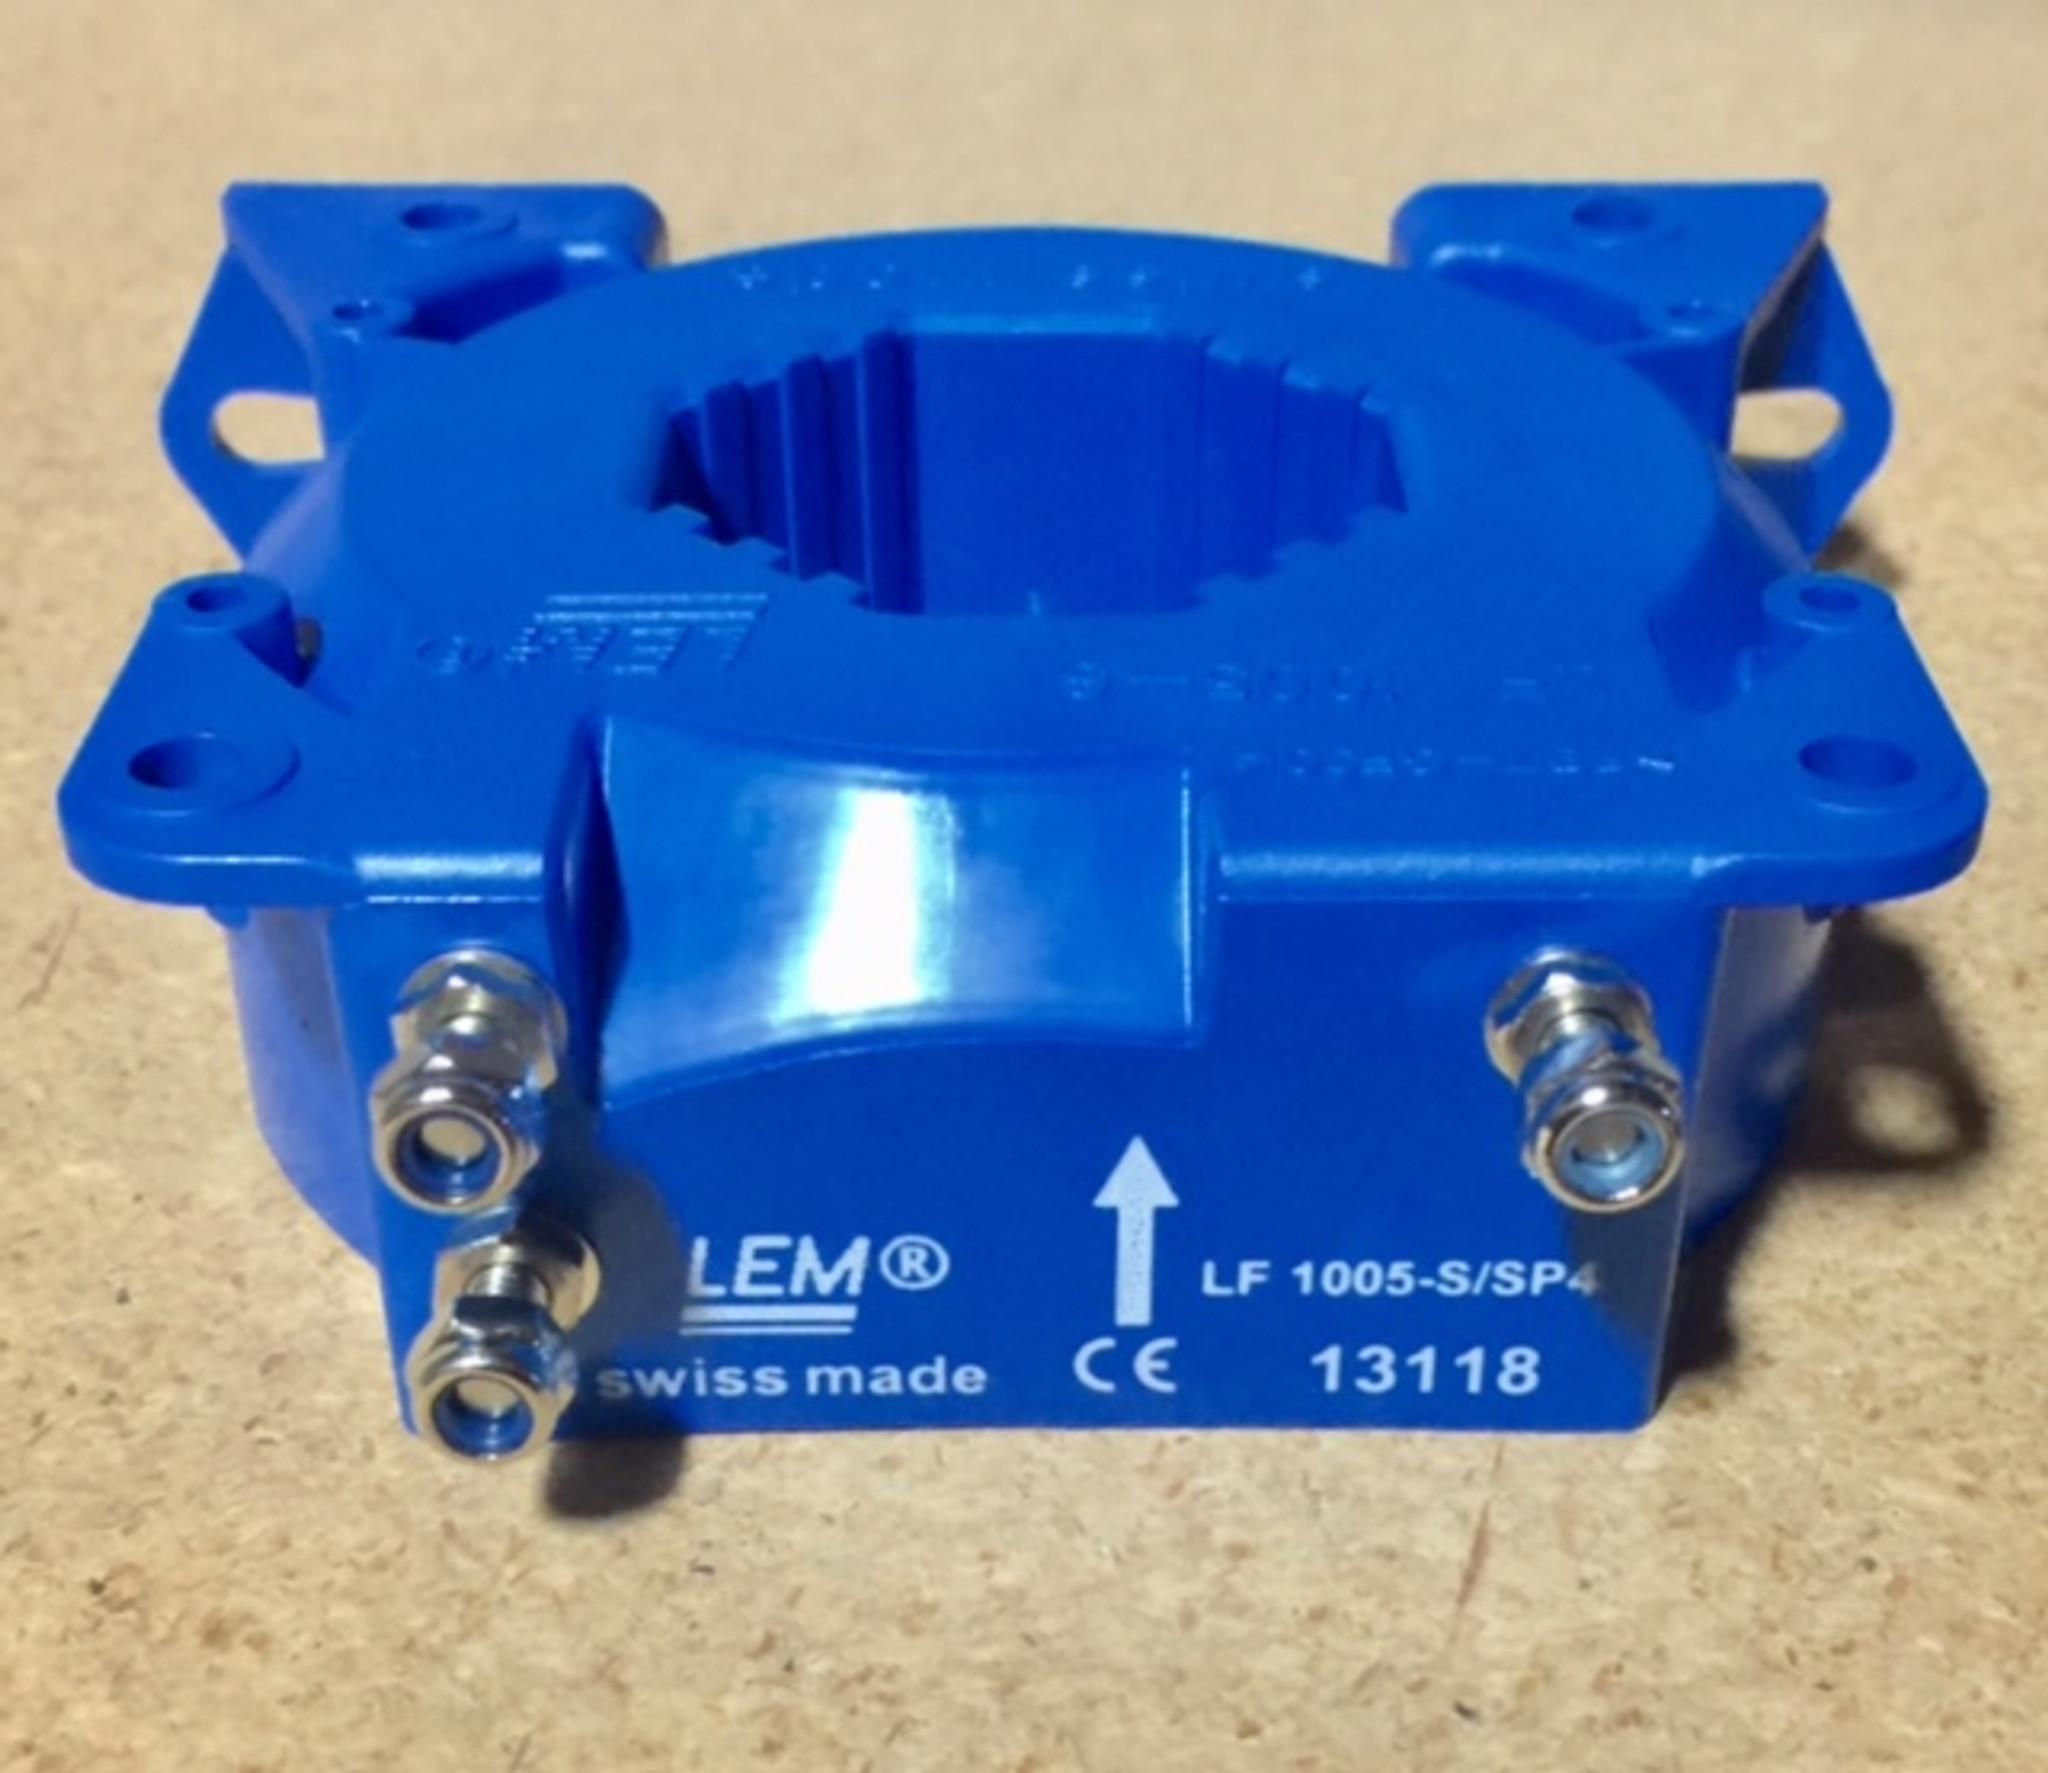 LEM Current Transducer LF 1005-S